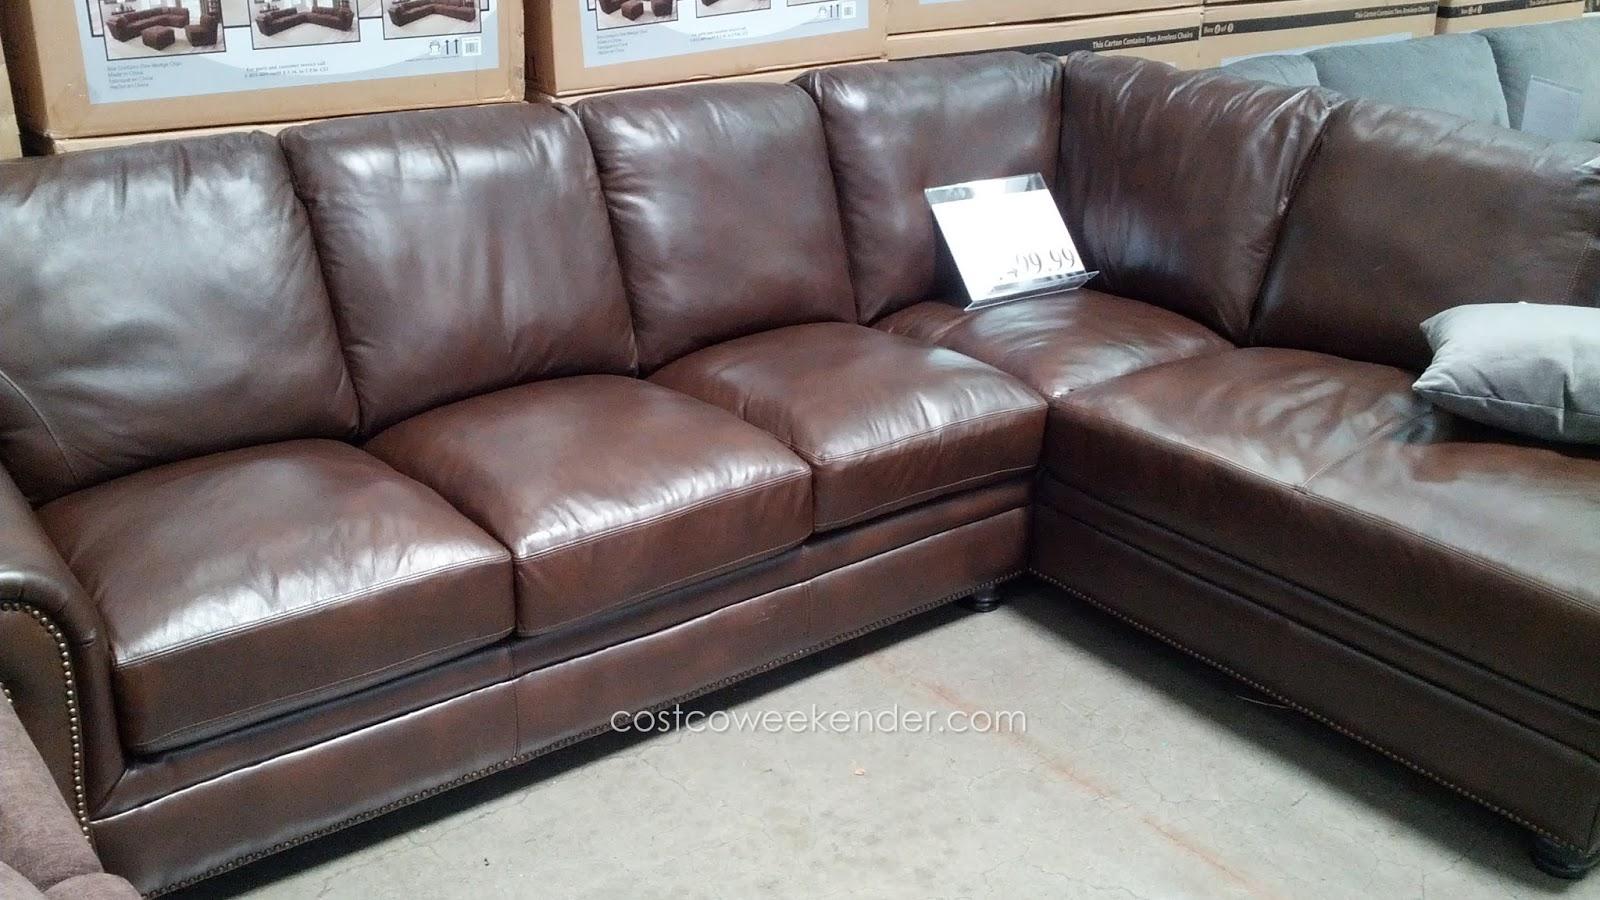 Costco Leather Sofa Review Thesofa. Black Leather Futon Costco Furniture